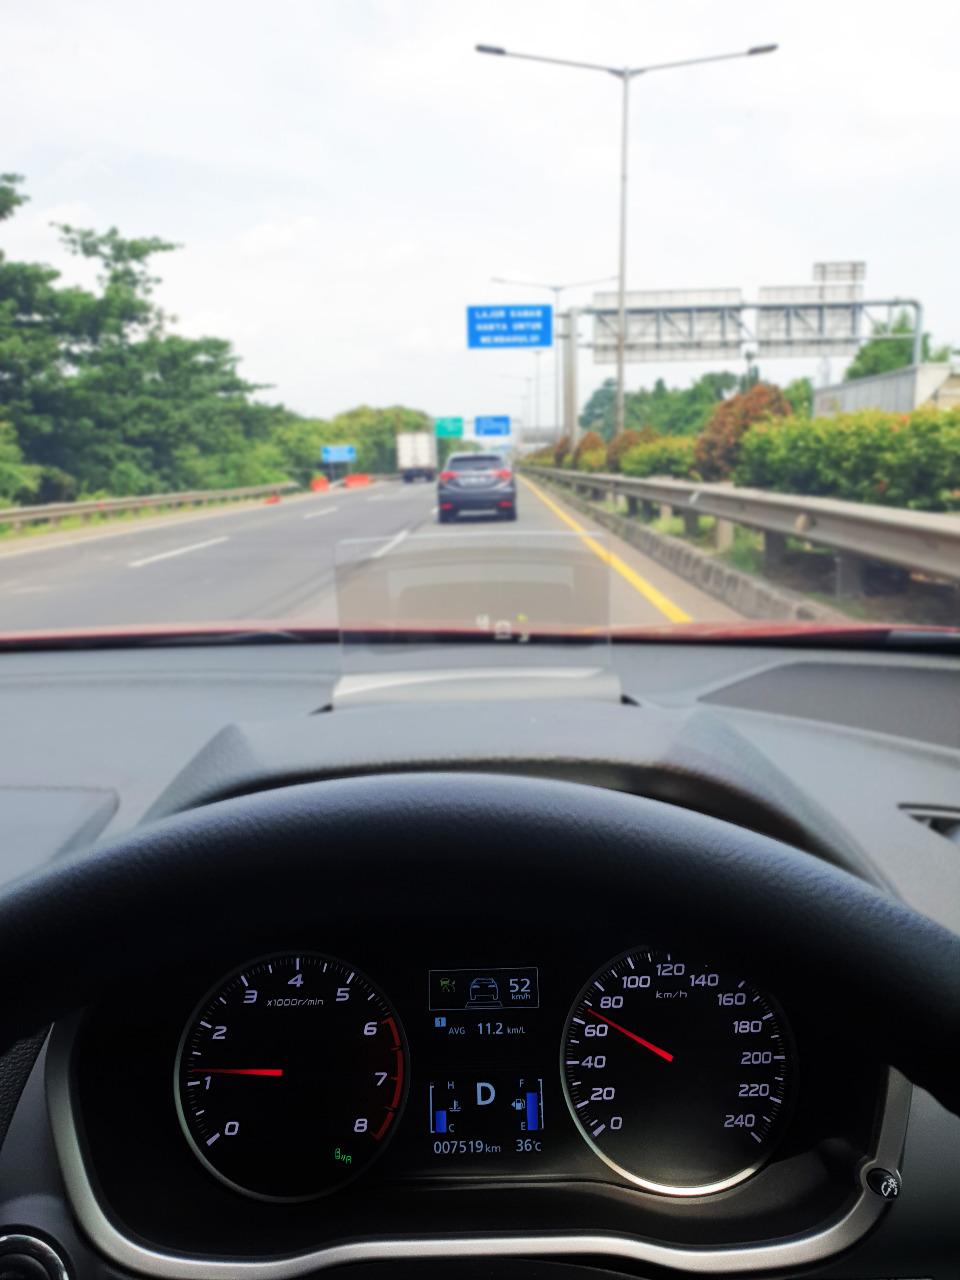 Keunggulan dari Adaptive Cruise Control di Mobil Mitsubishi